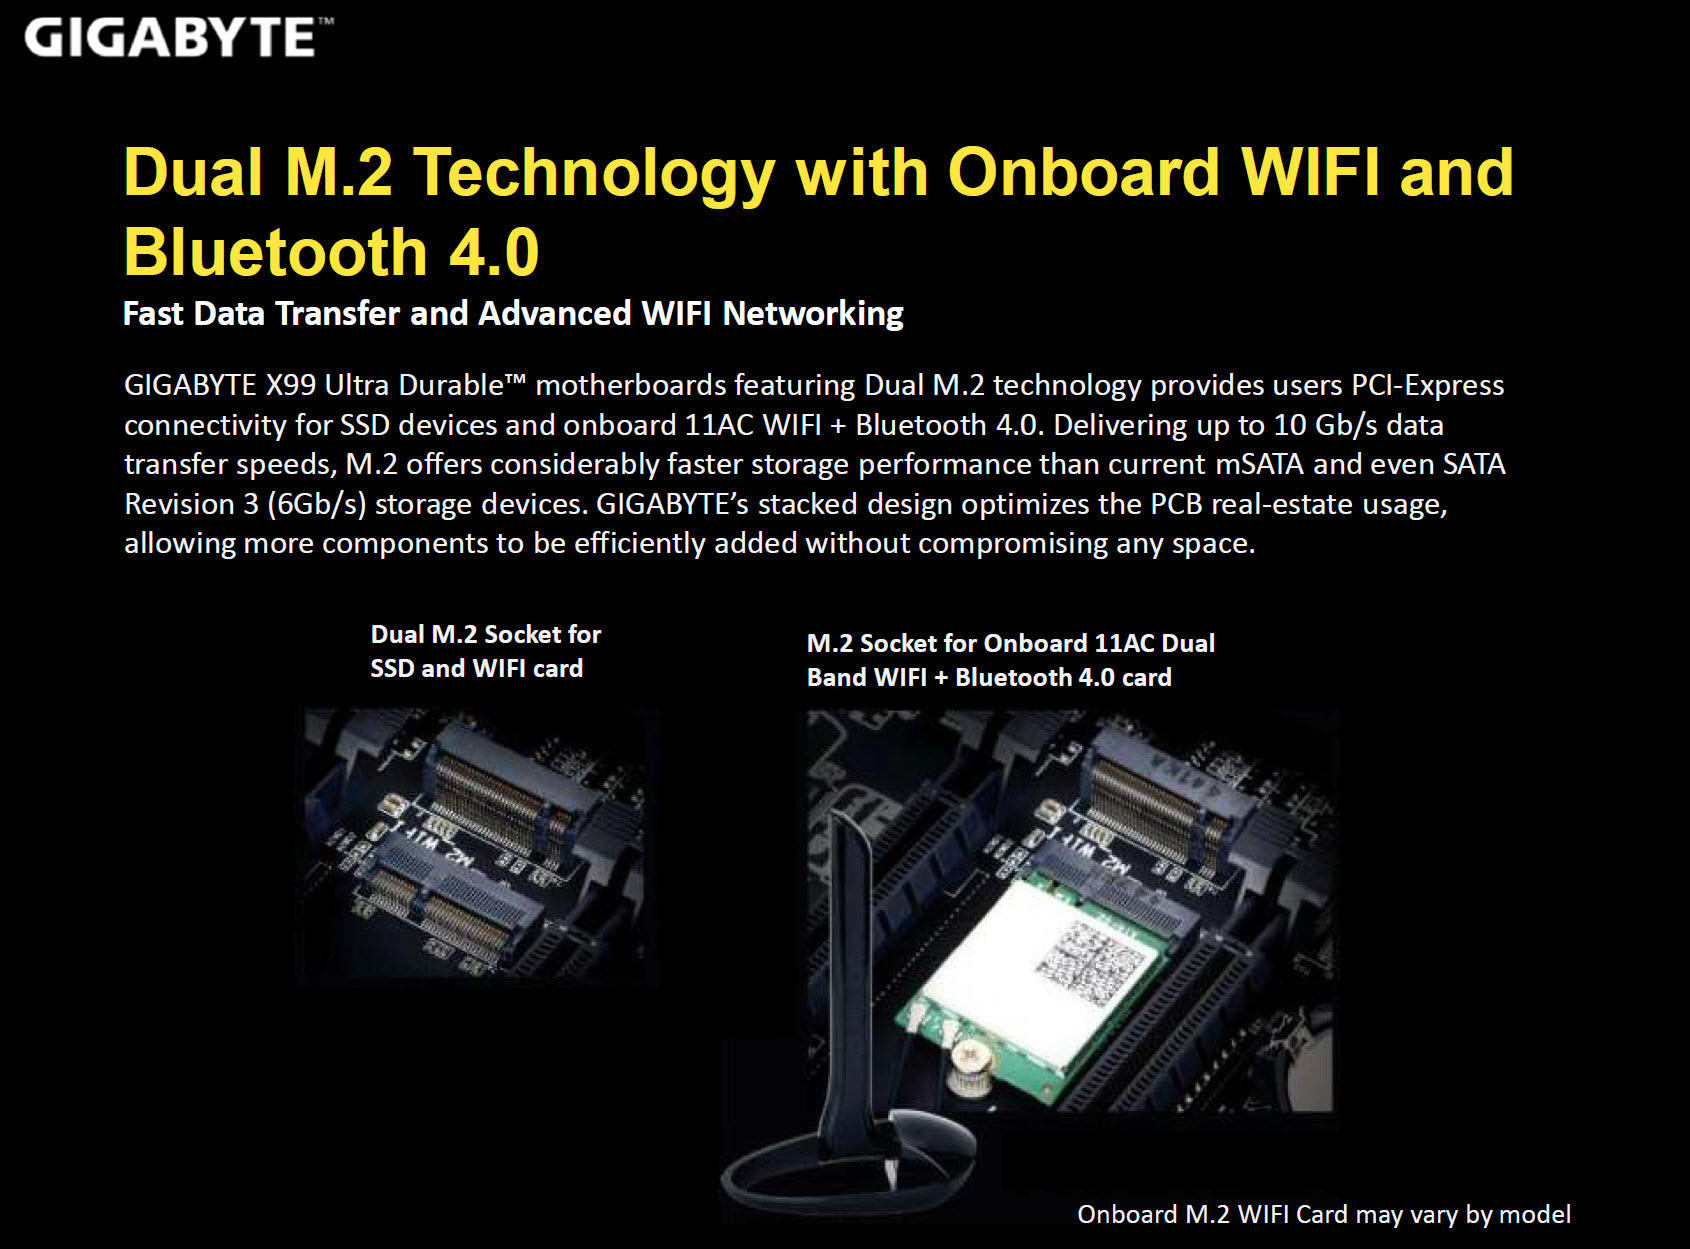 gigabyte-x99-ud7-wifi_dual-m-2